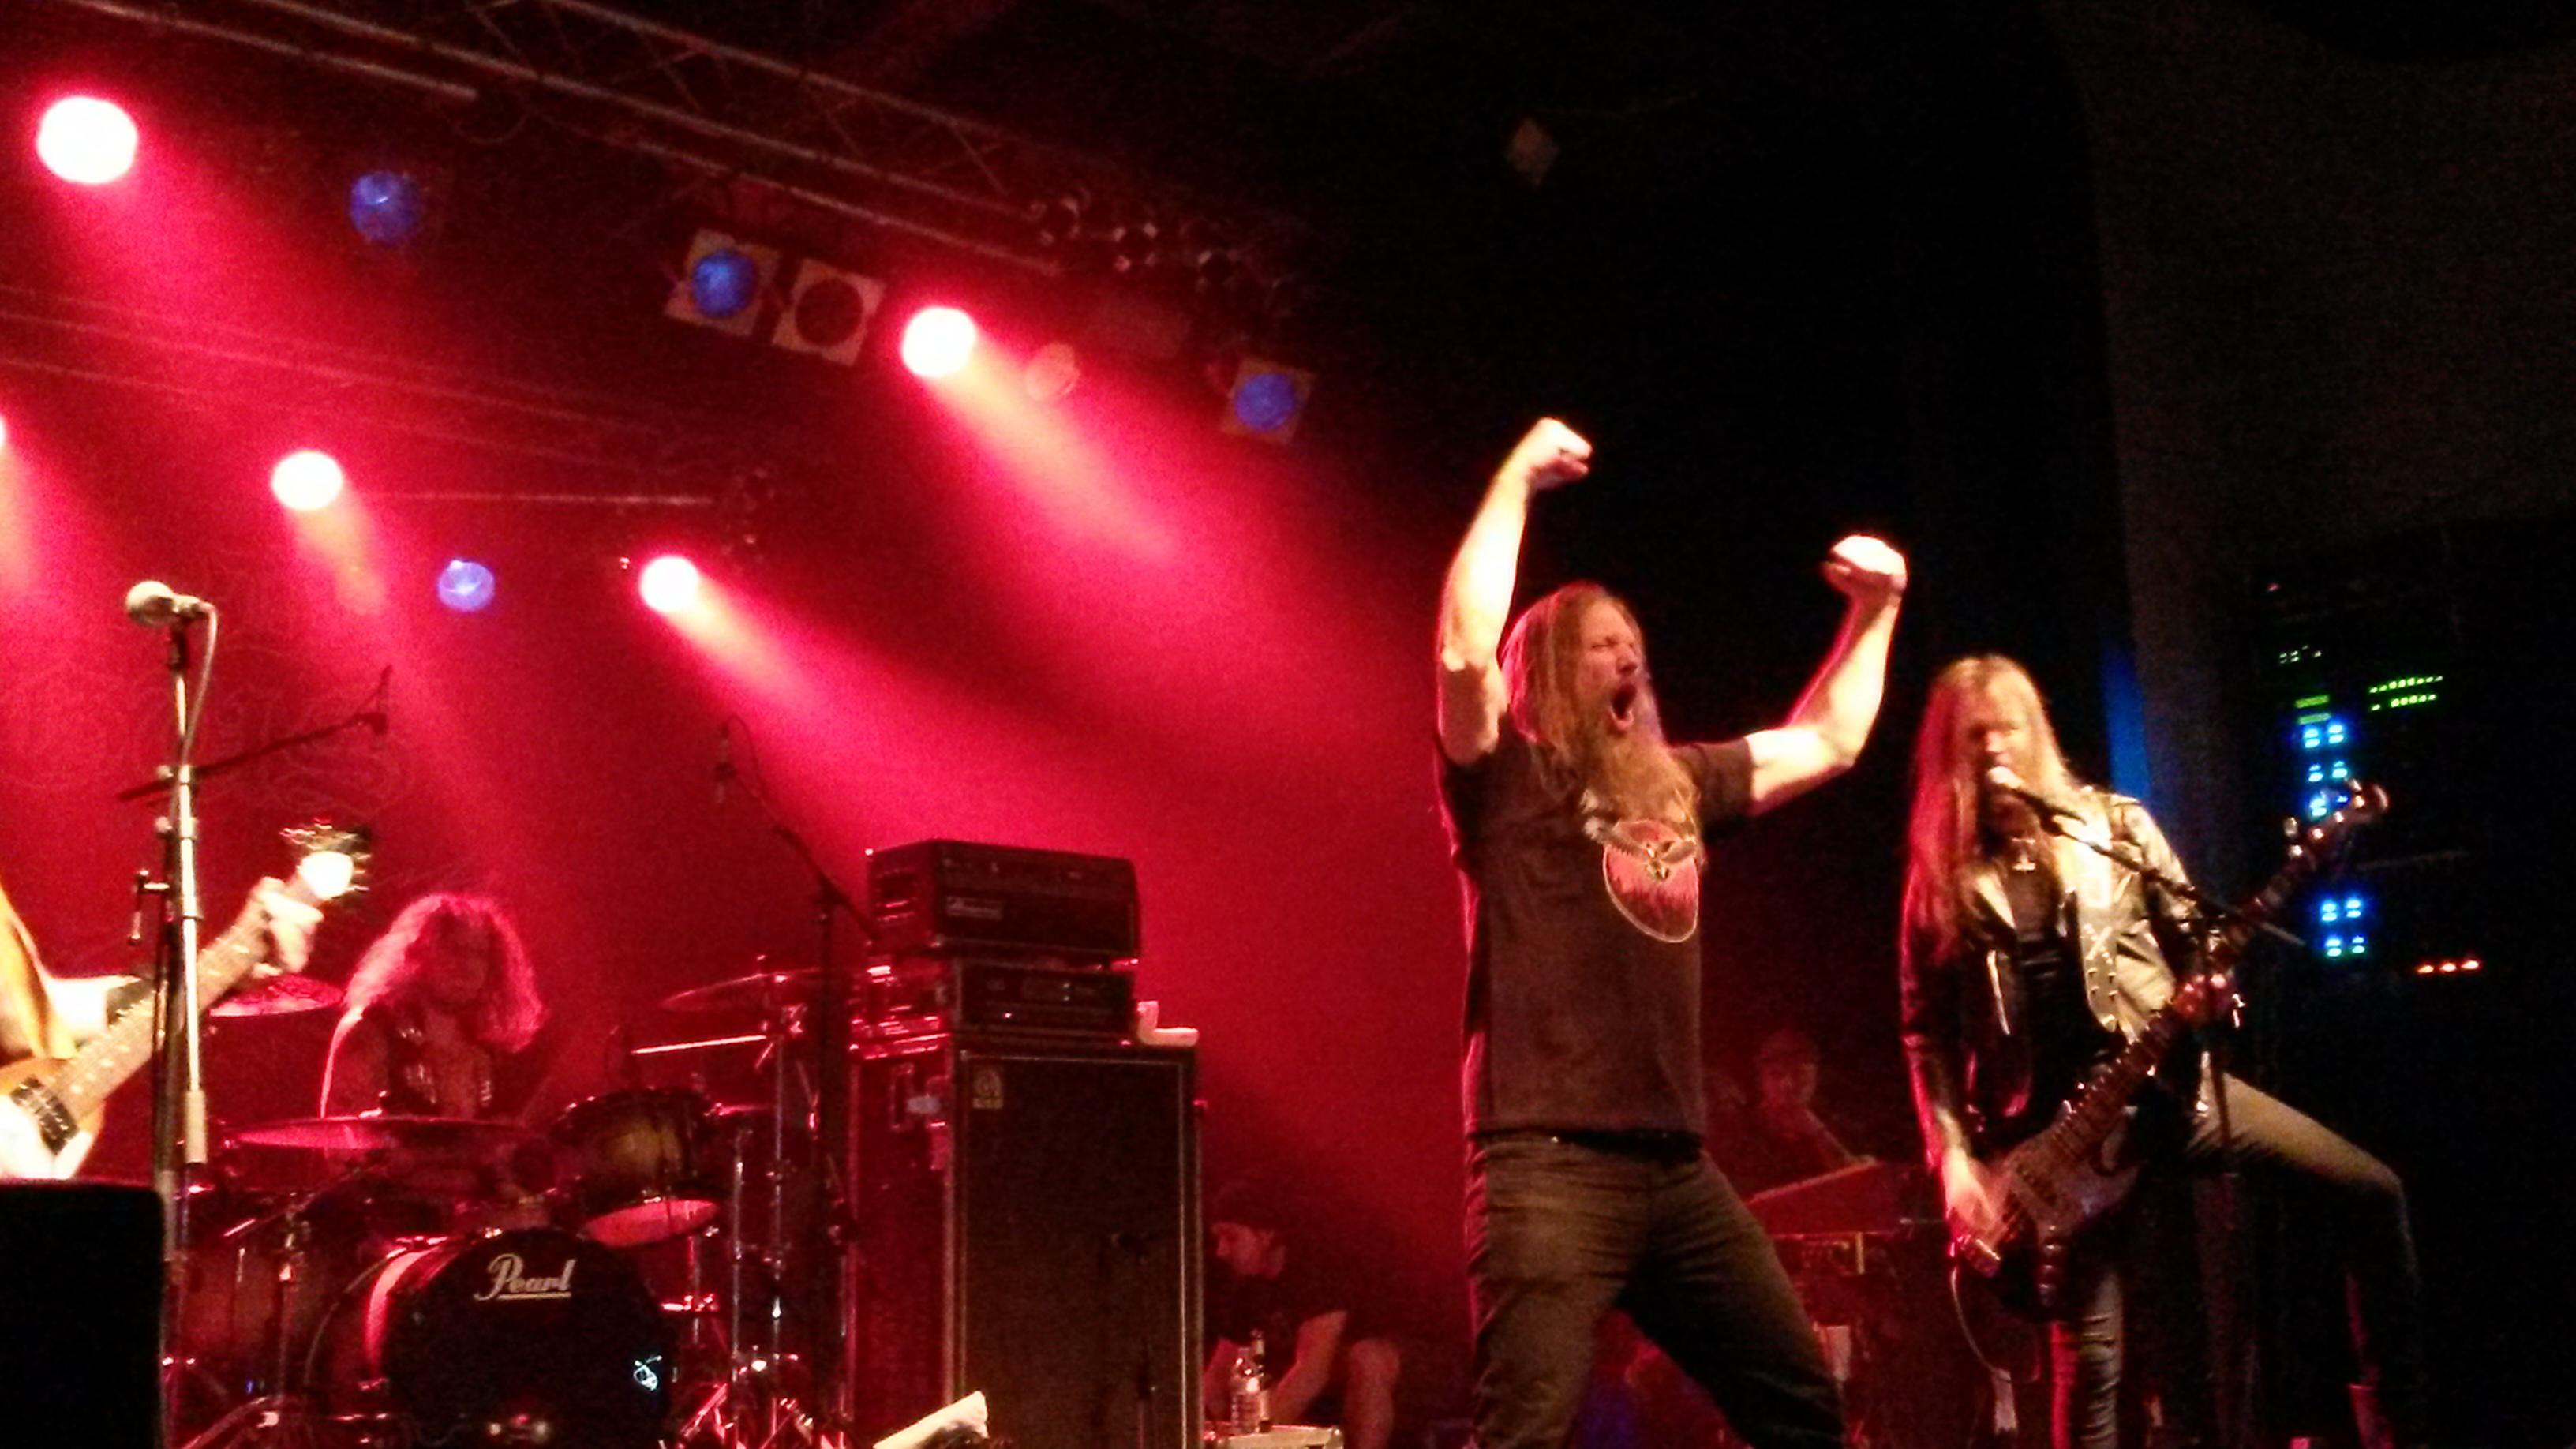 Grand Magus mit Johan Hegg (Amon Amarth) live, 24.03.2014, Berlin